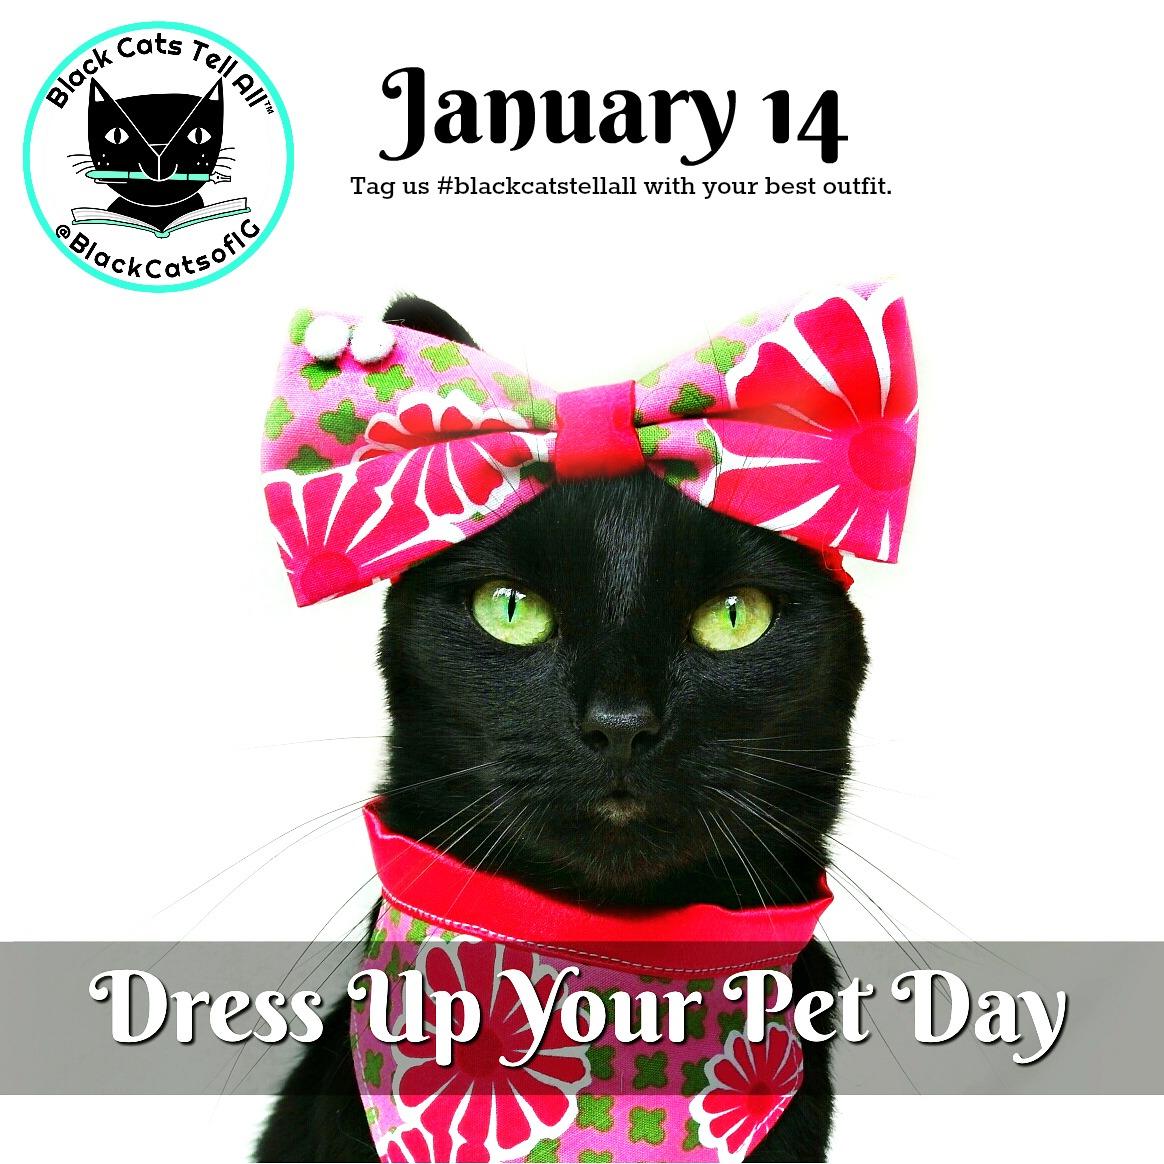 dress_up_your-pet_@catwisdom101